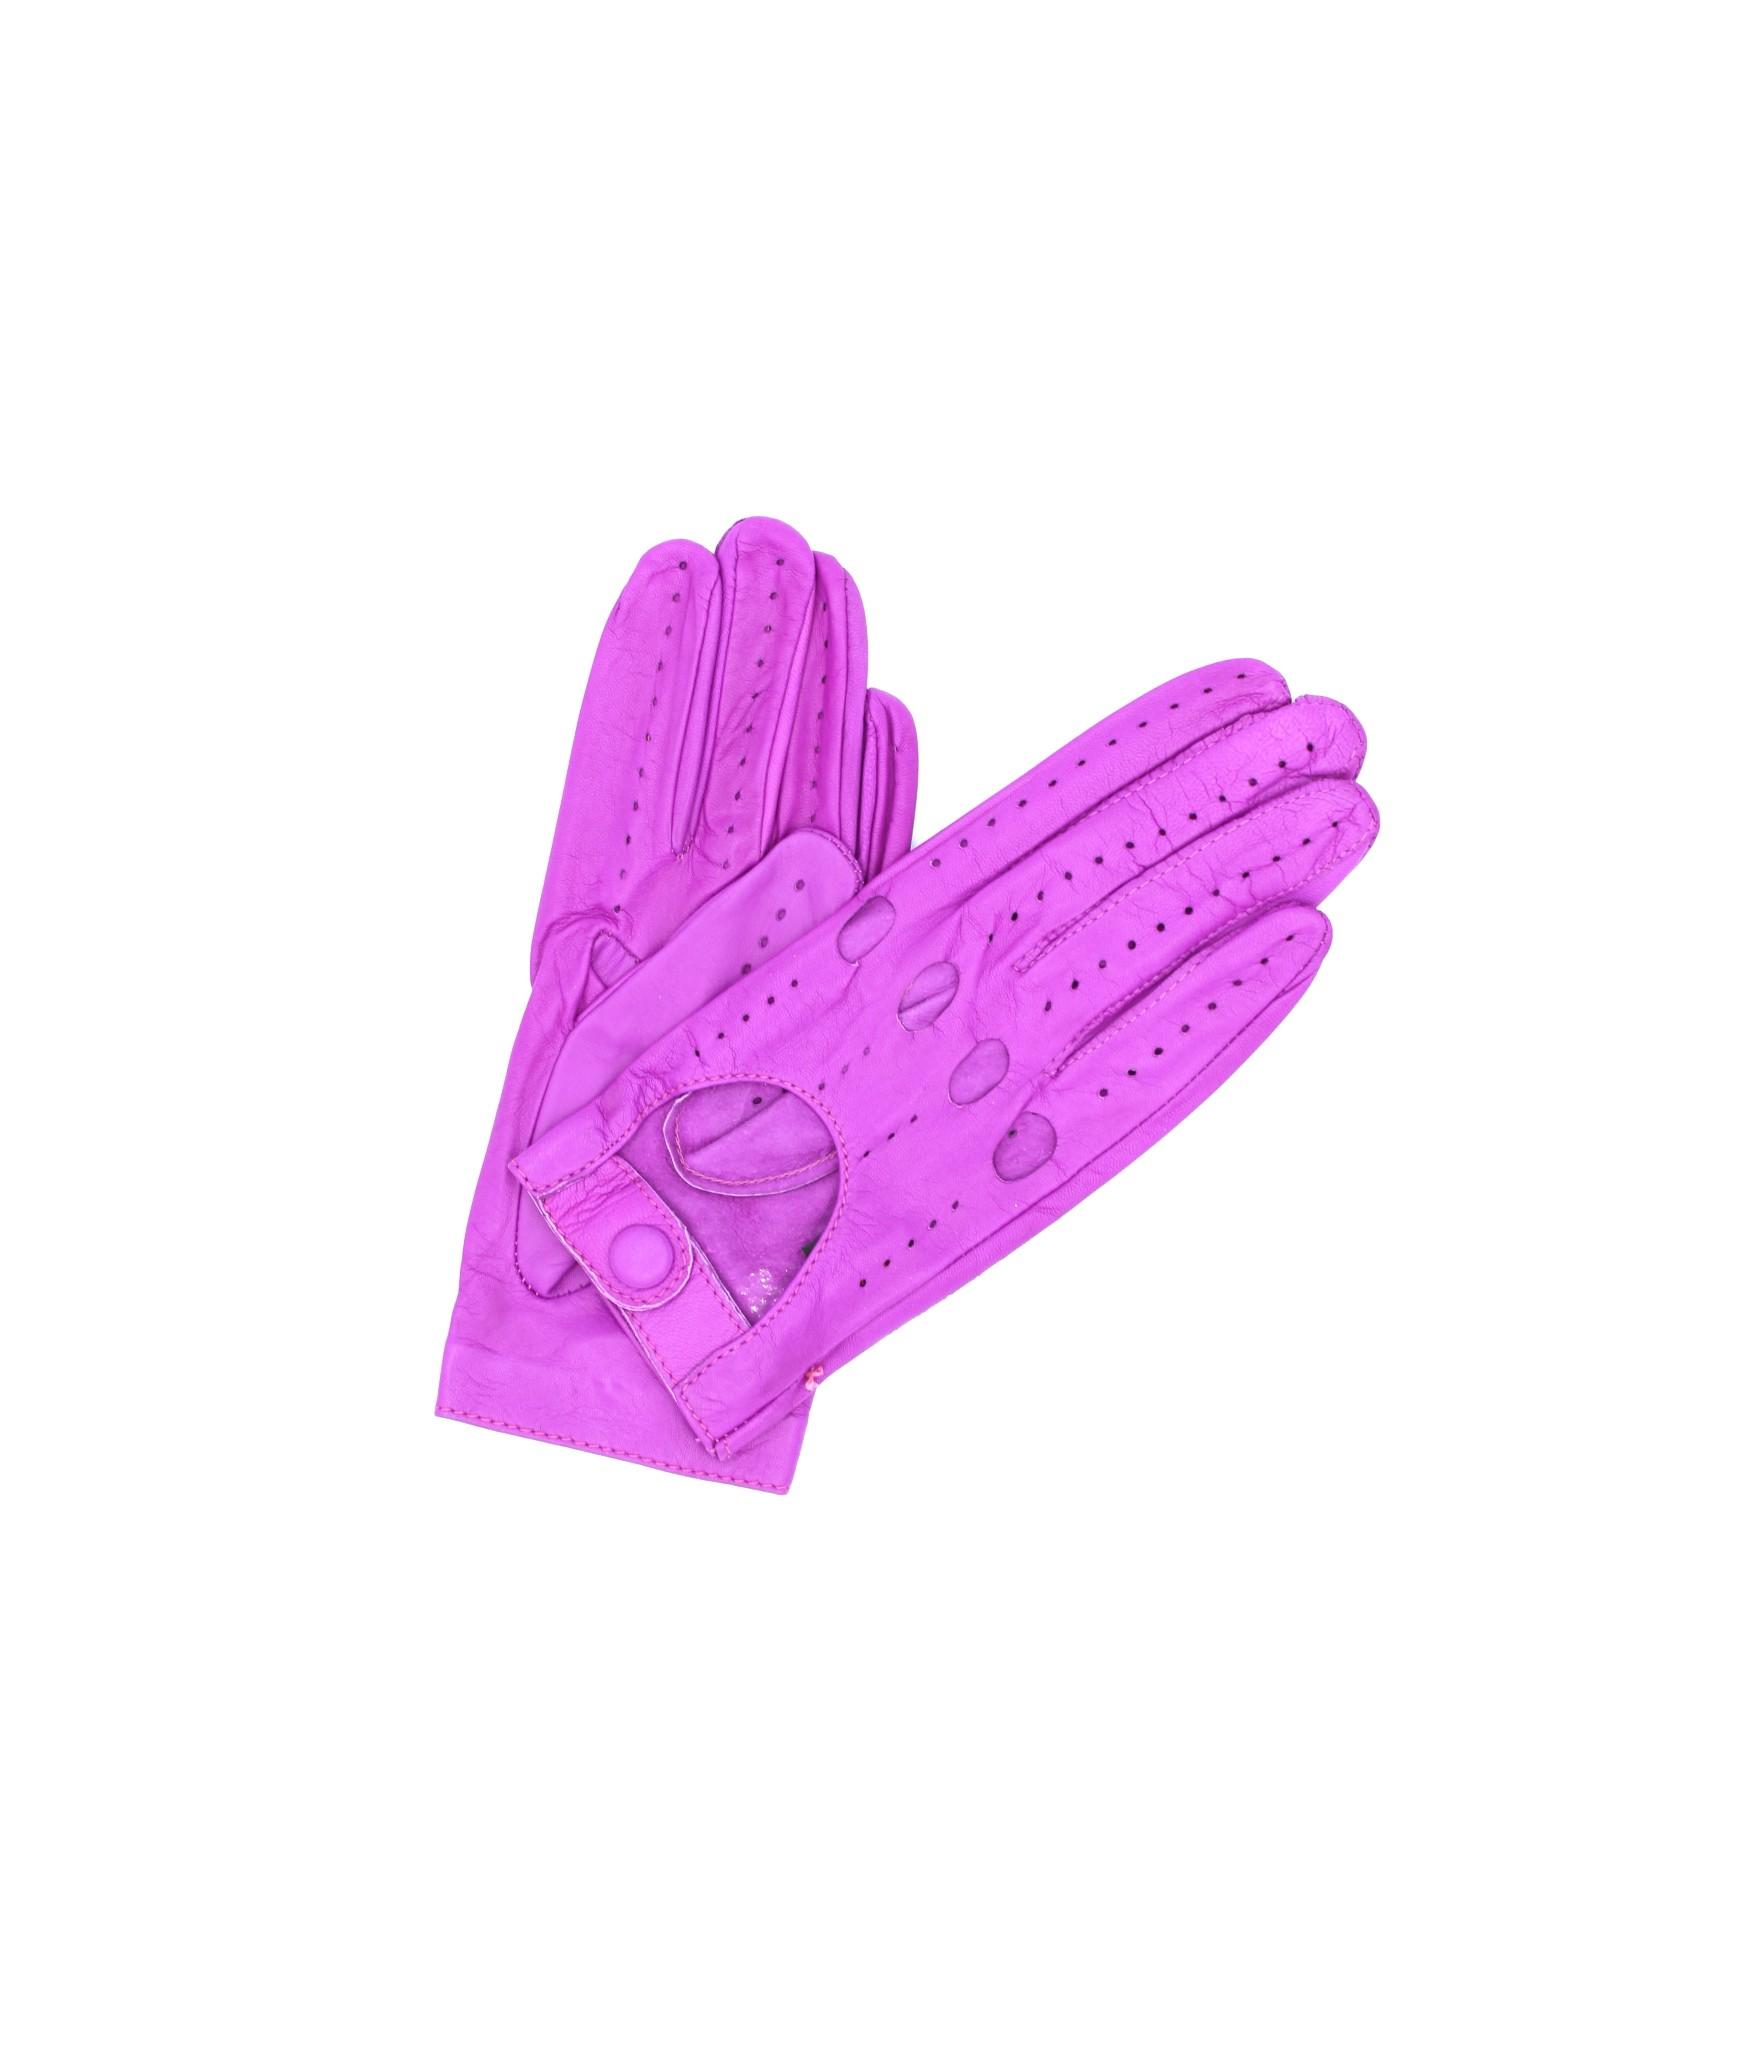 Driving gloves in Nappa Leather Fuchsia Sermoneta Gloves